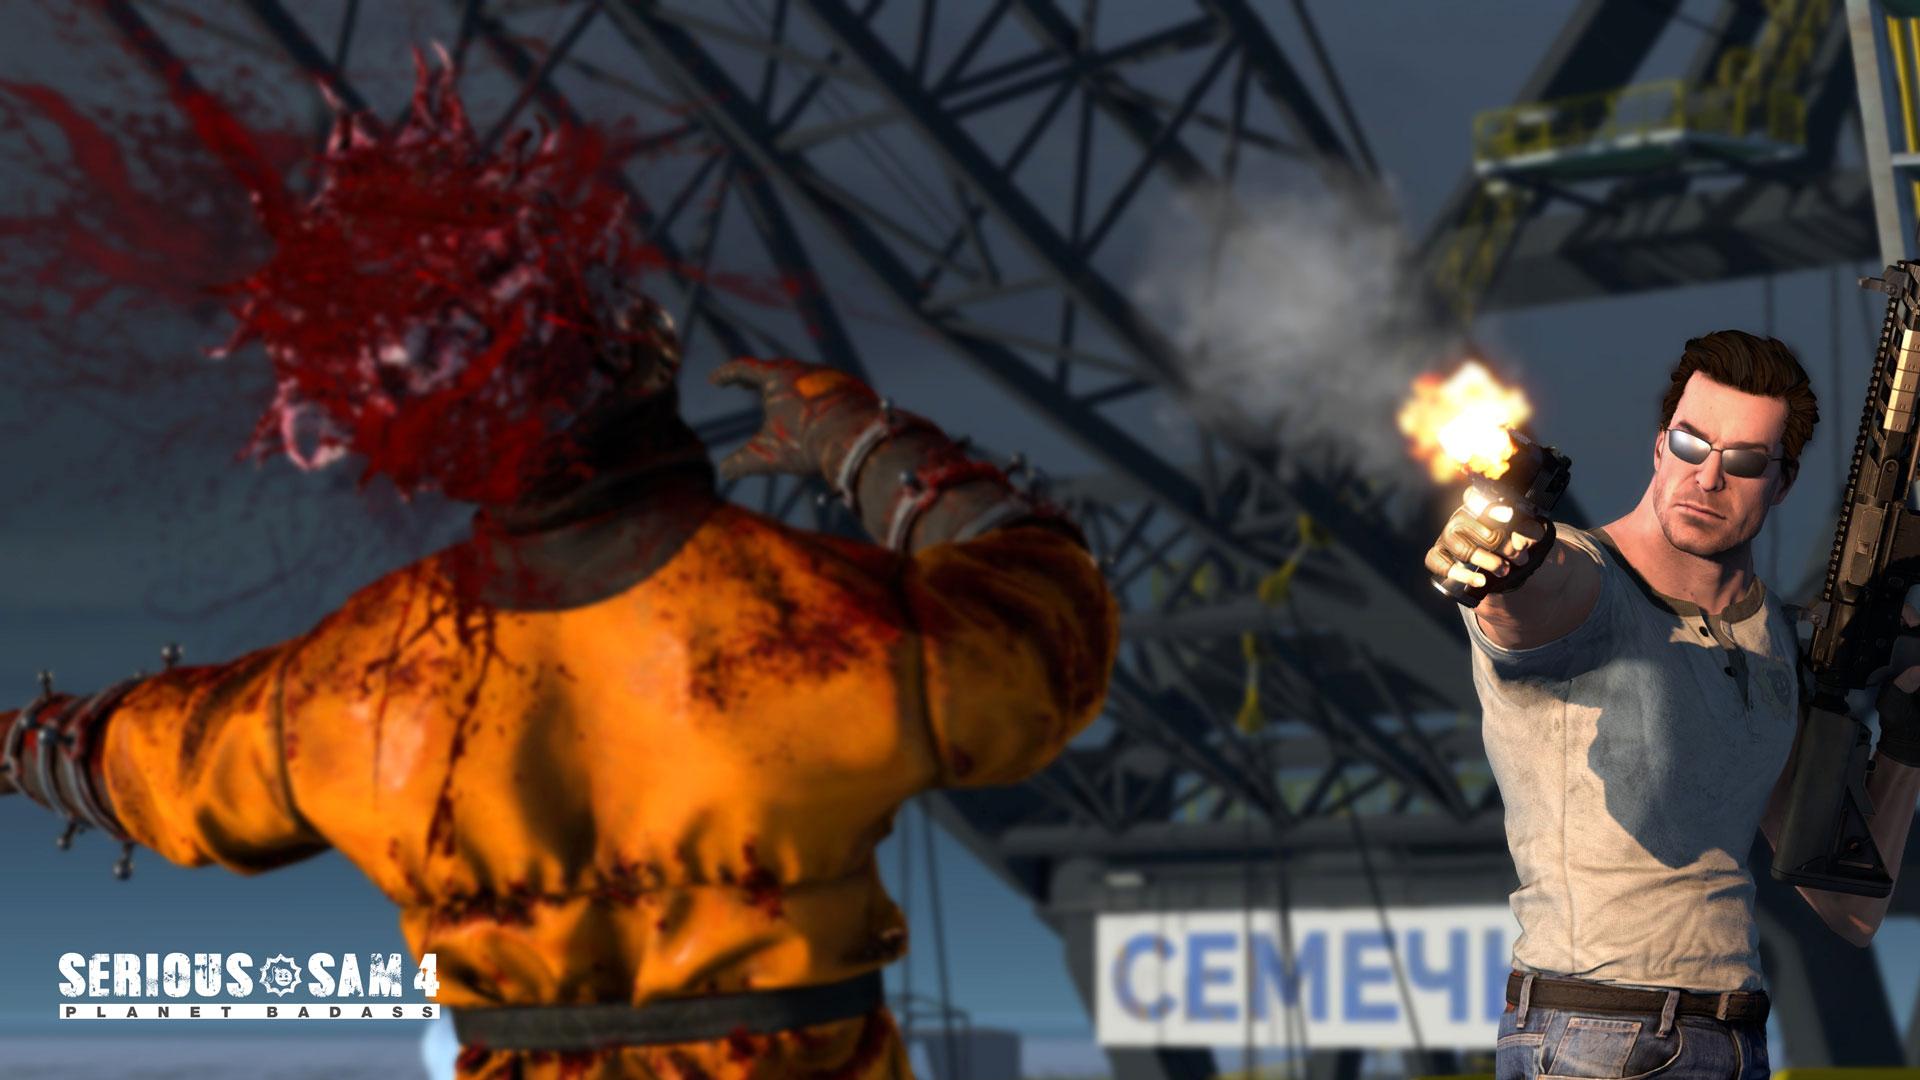 Serious Sam 4 Screenshots #2 Bild: Croteam